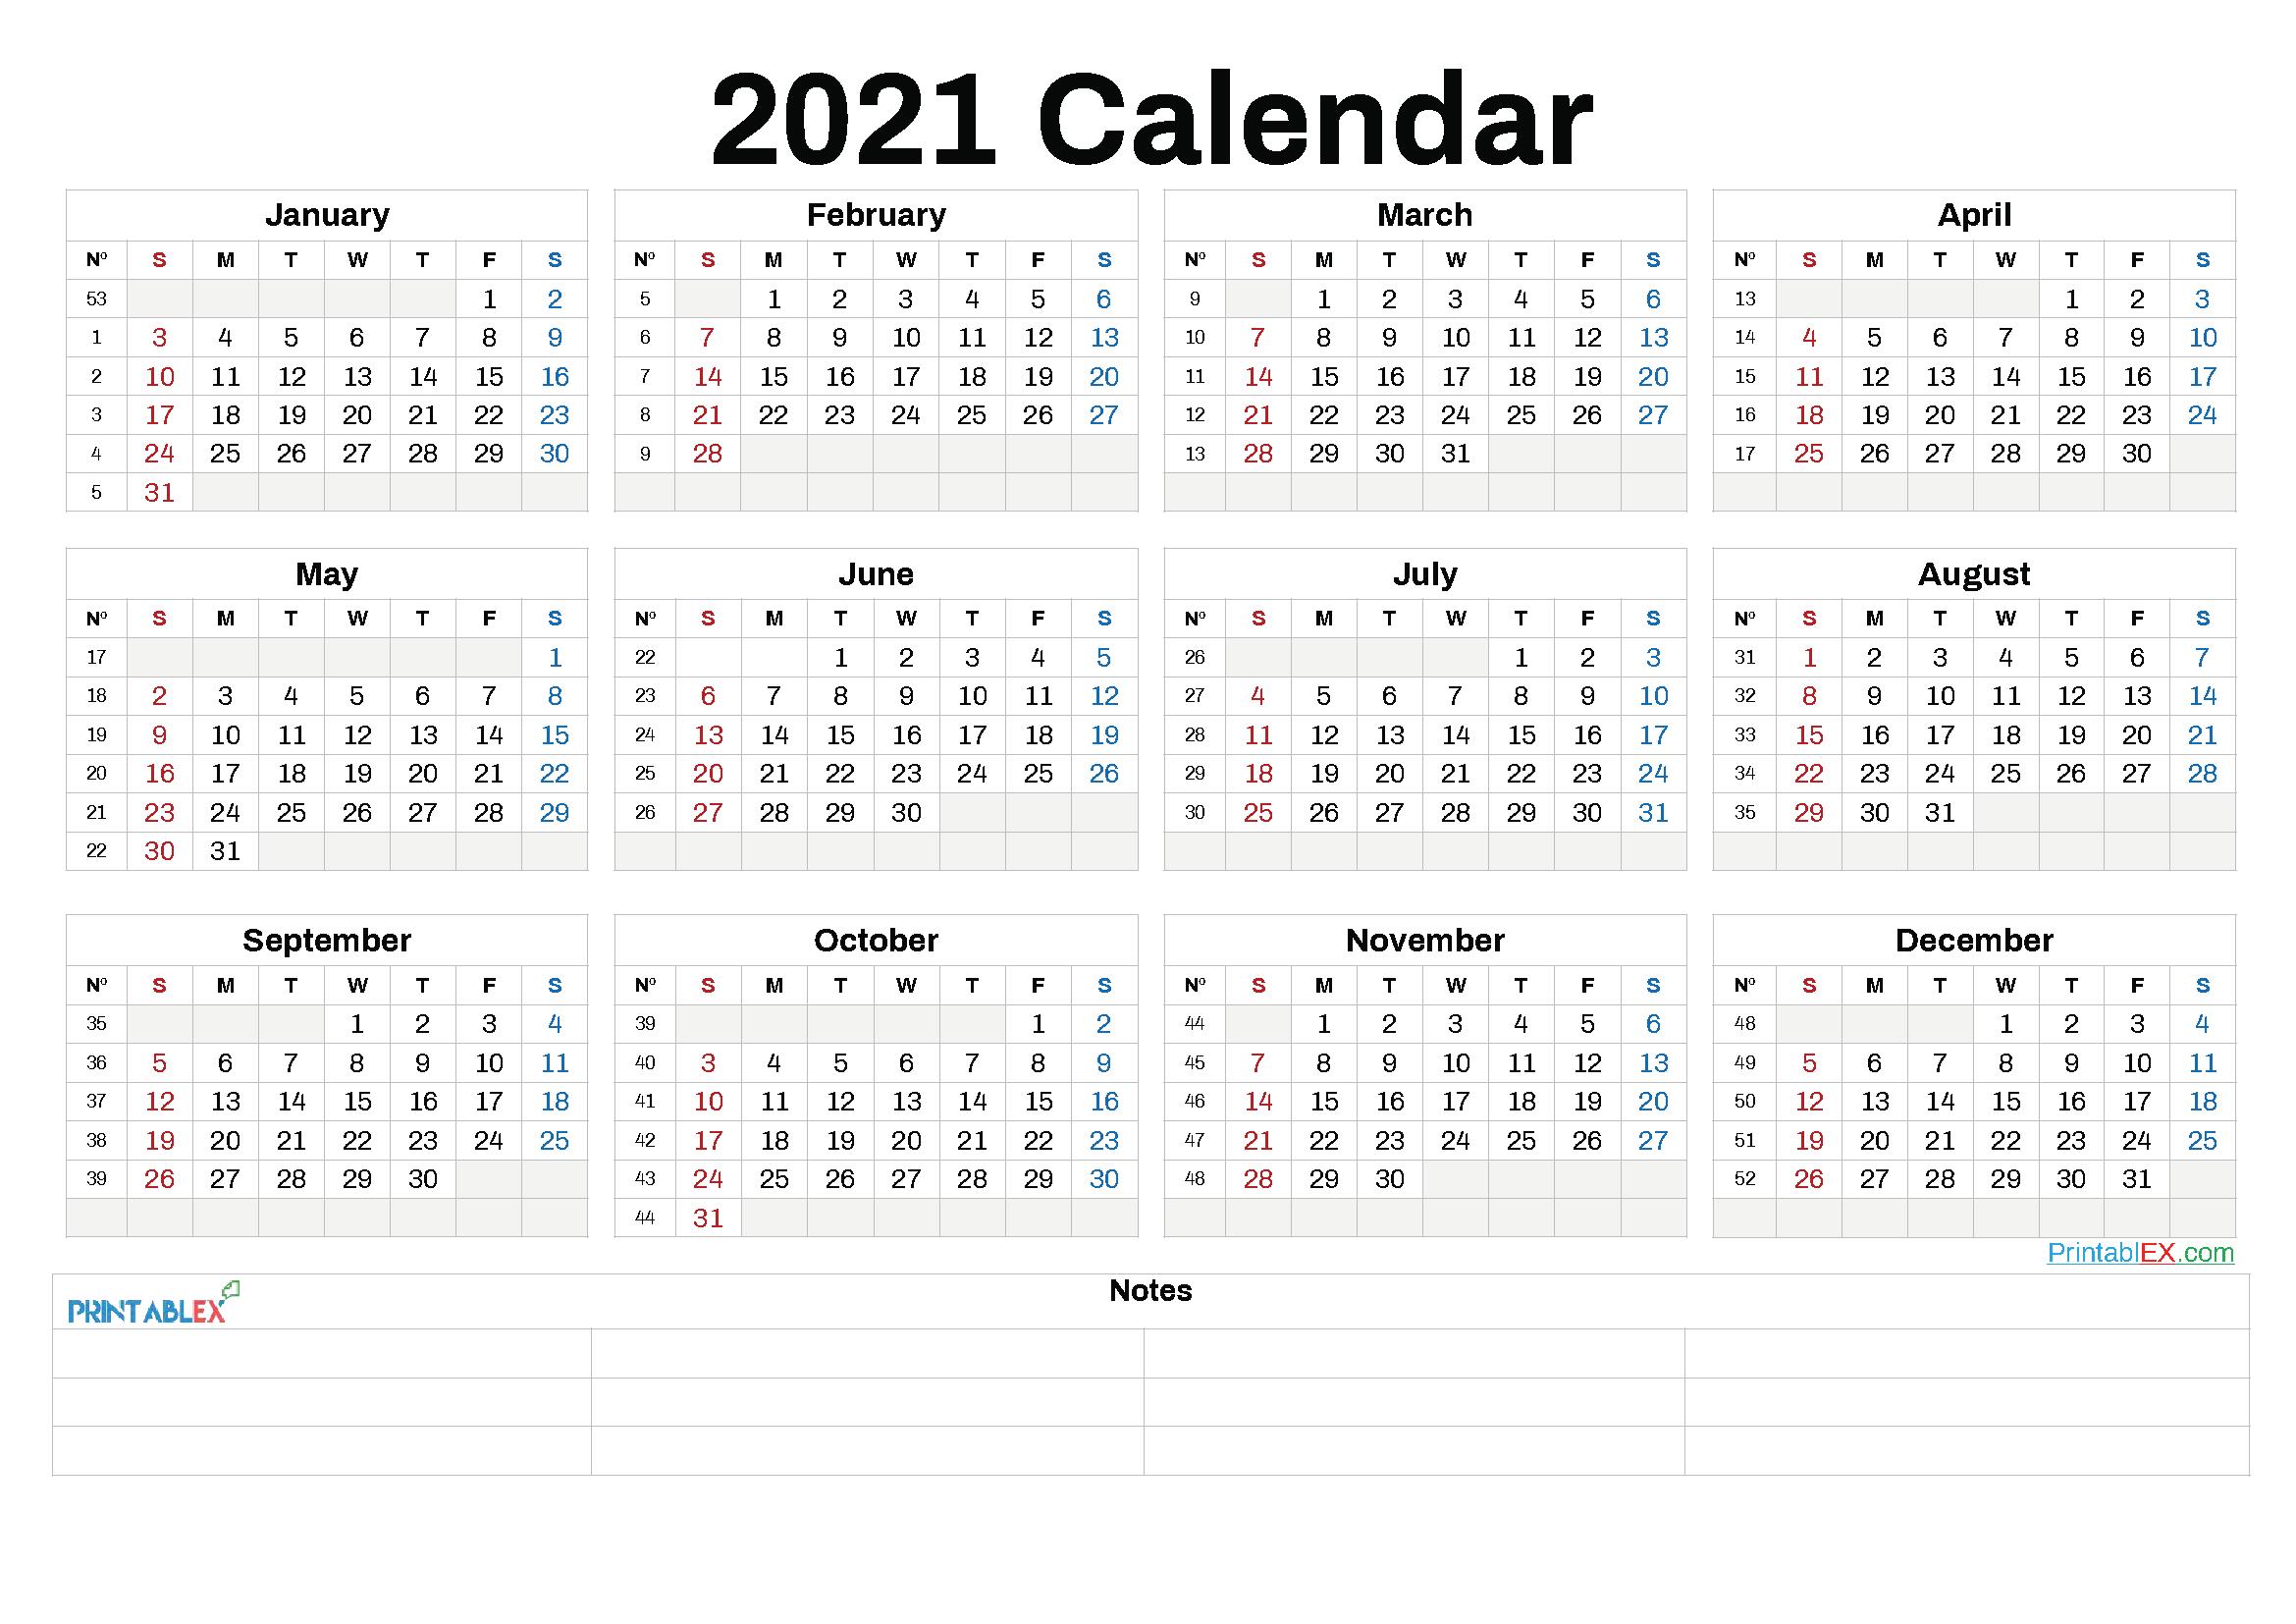 2021 Annual Calendar Printable   2021 Printable Calendars pertaining to 2021 Calendar Free Printable